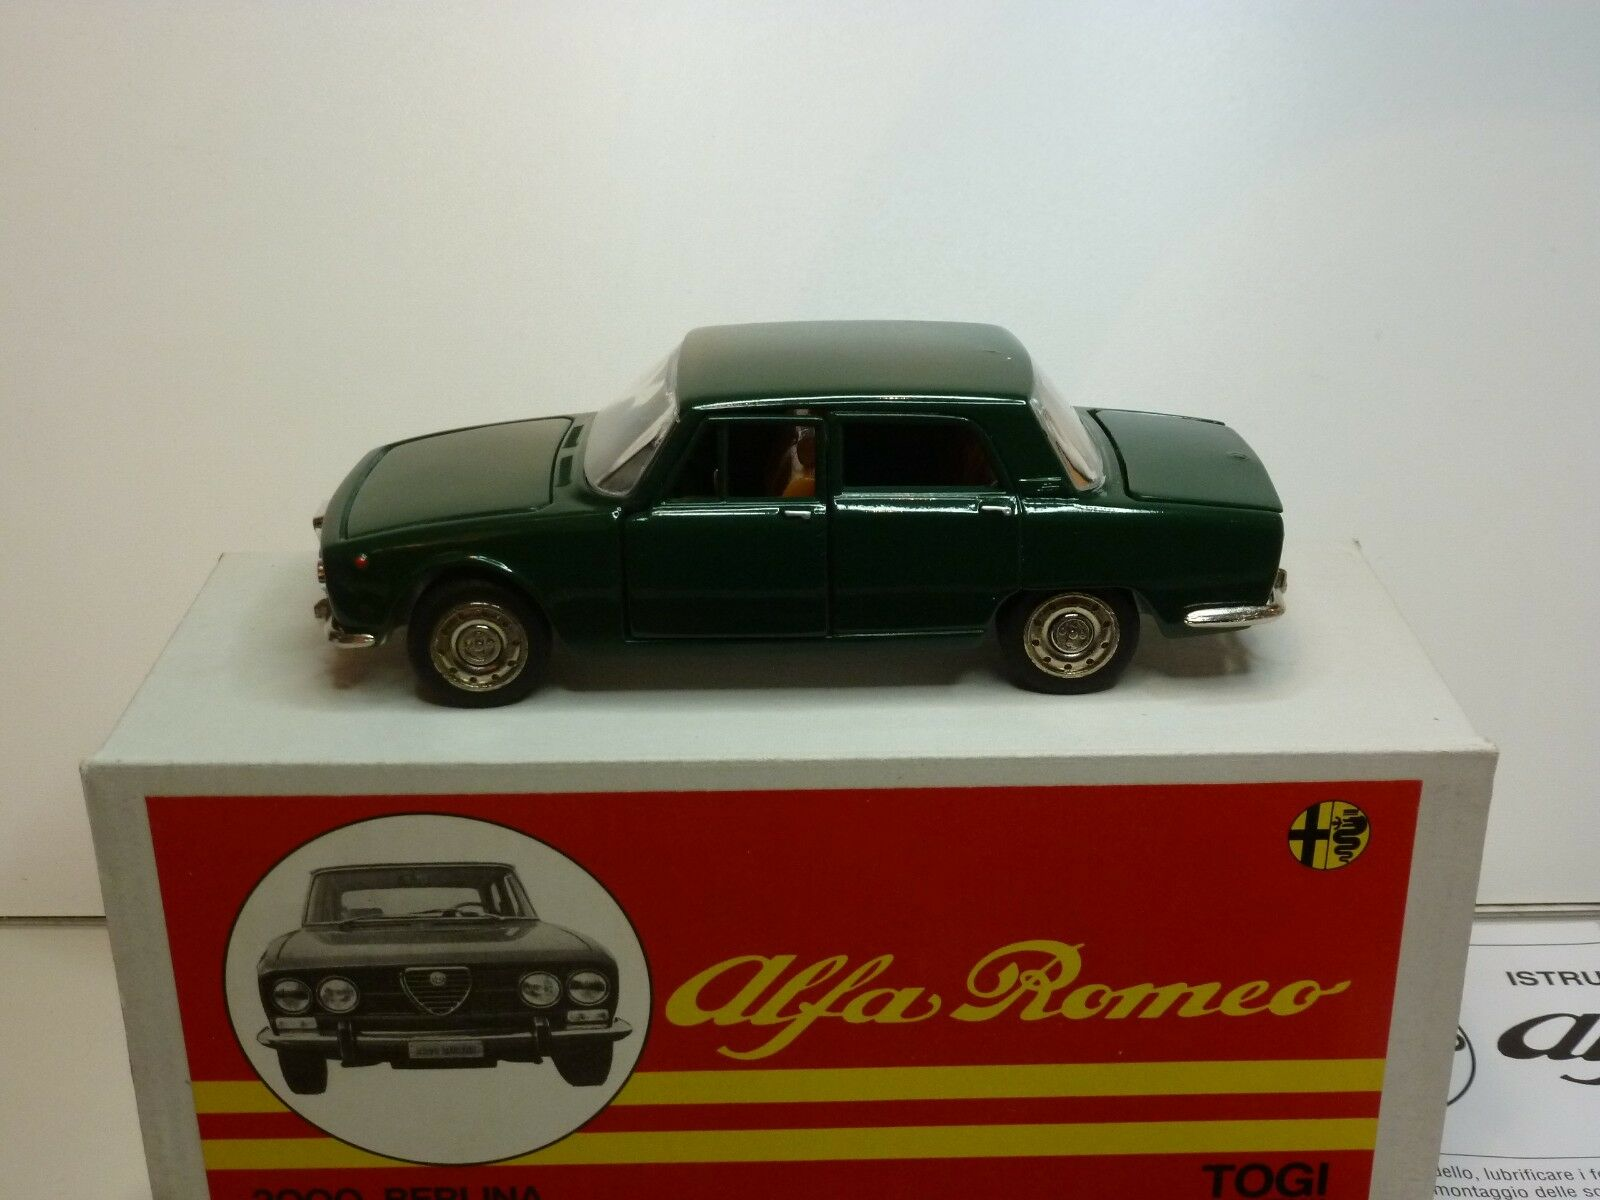 TOGI 9 72 ALFA ROMEO 2000 BERLINA - ENGLISH verde 1 23 - VERY GOOD IN BOX